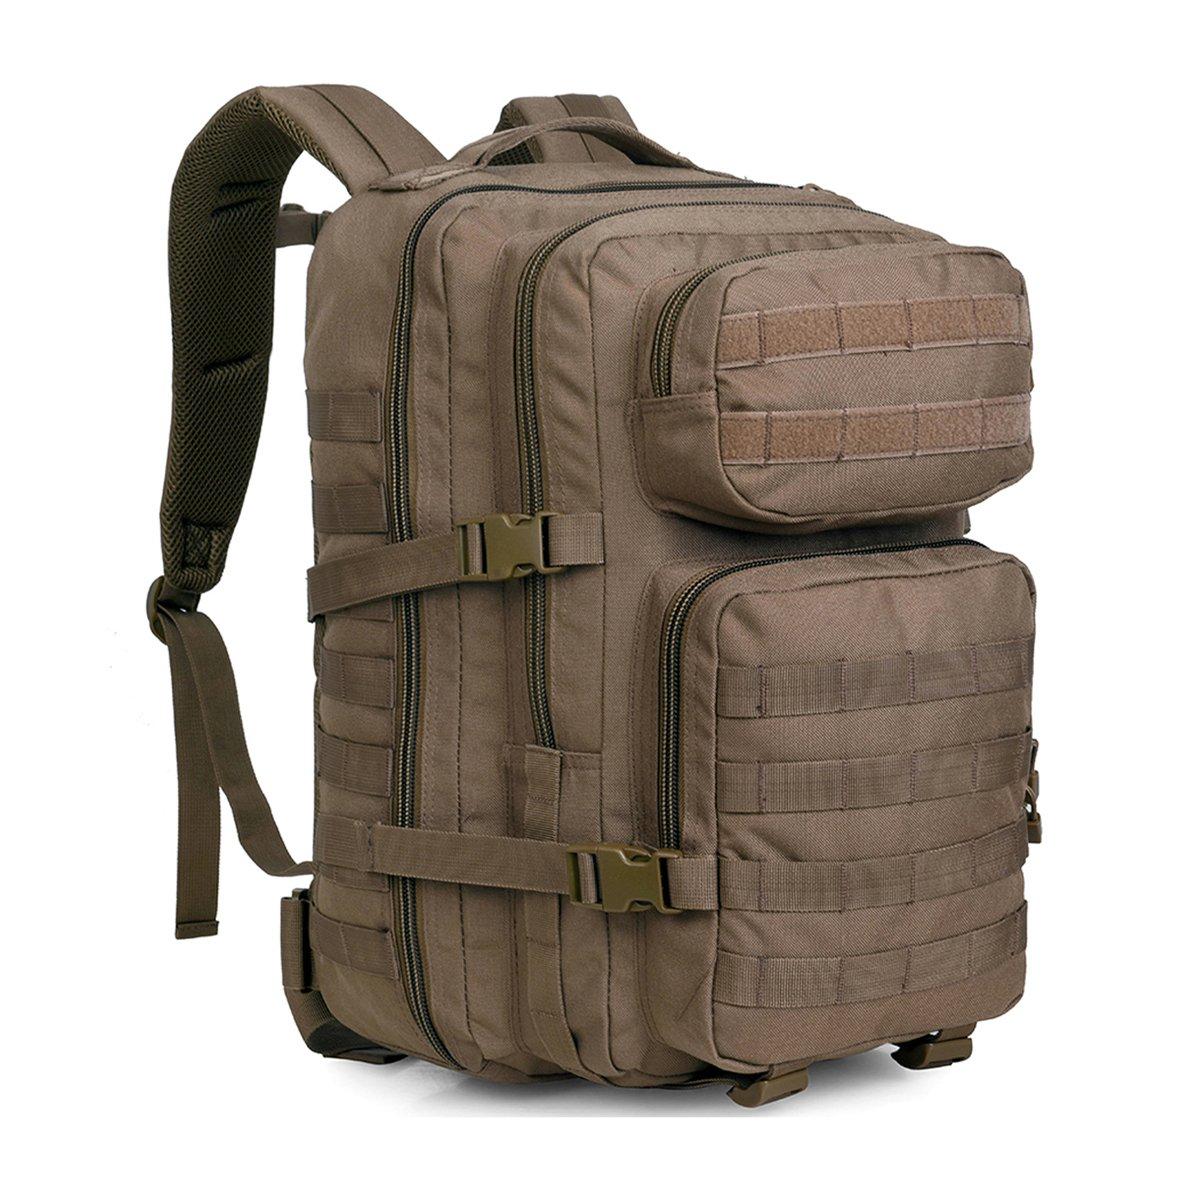 wideway Tacticalバックパック50l MilitaryアウトドアAssault Gear Large Molle Hydrationタクティカルギア  50L Coyote B06XCMKVBD